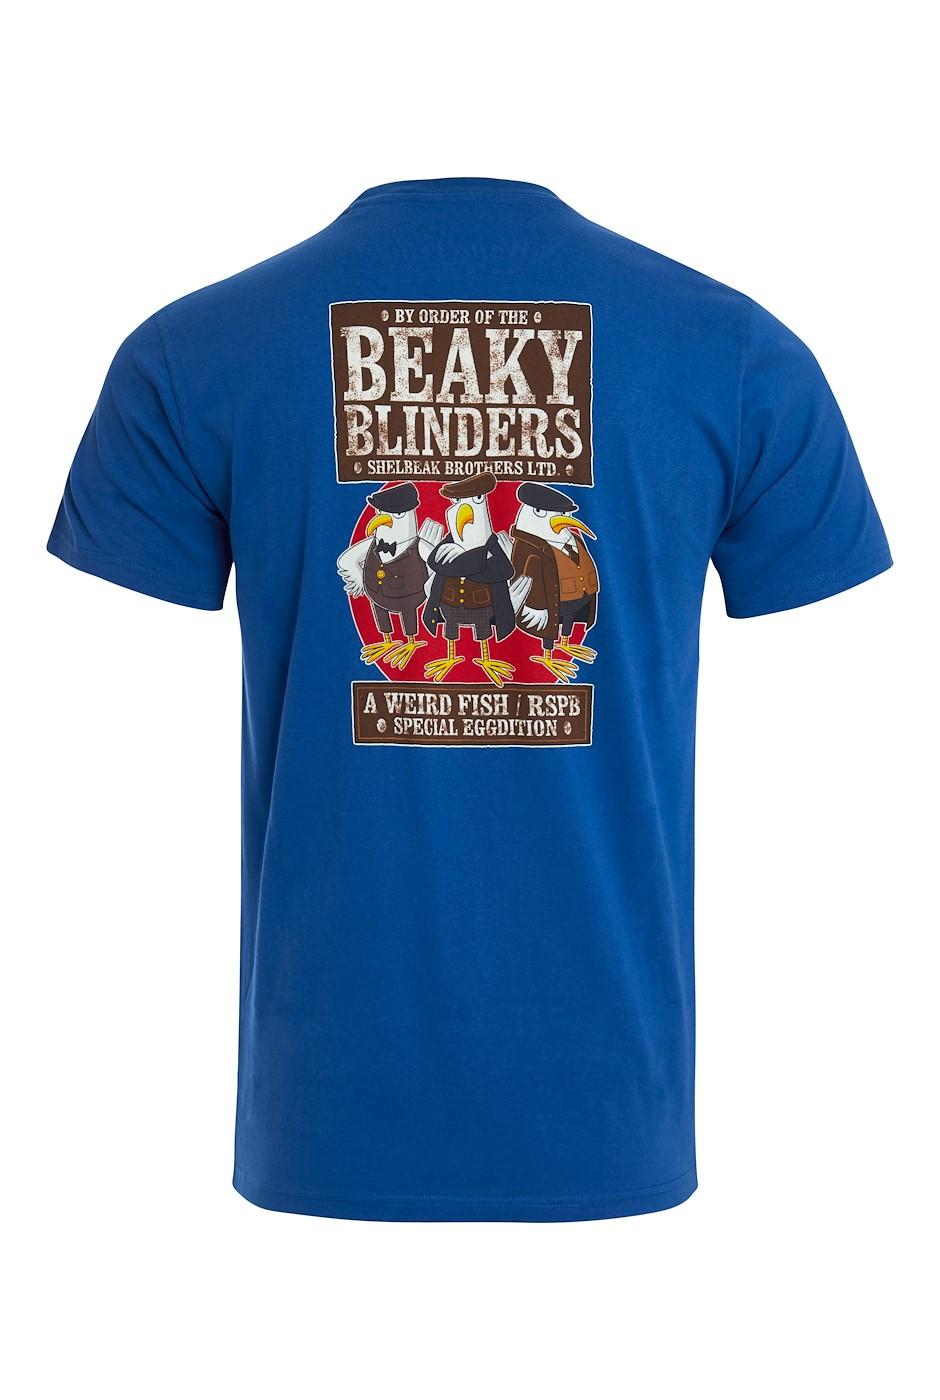 Beaky Blinders Organic Cotton RSPB Artist T-Shirt True Blue